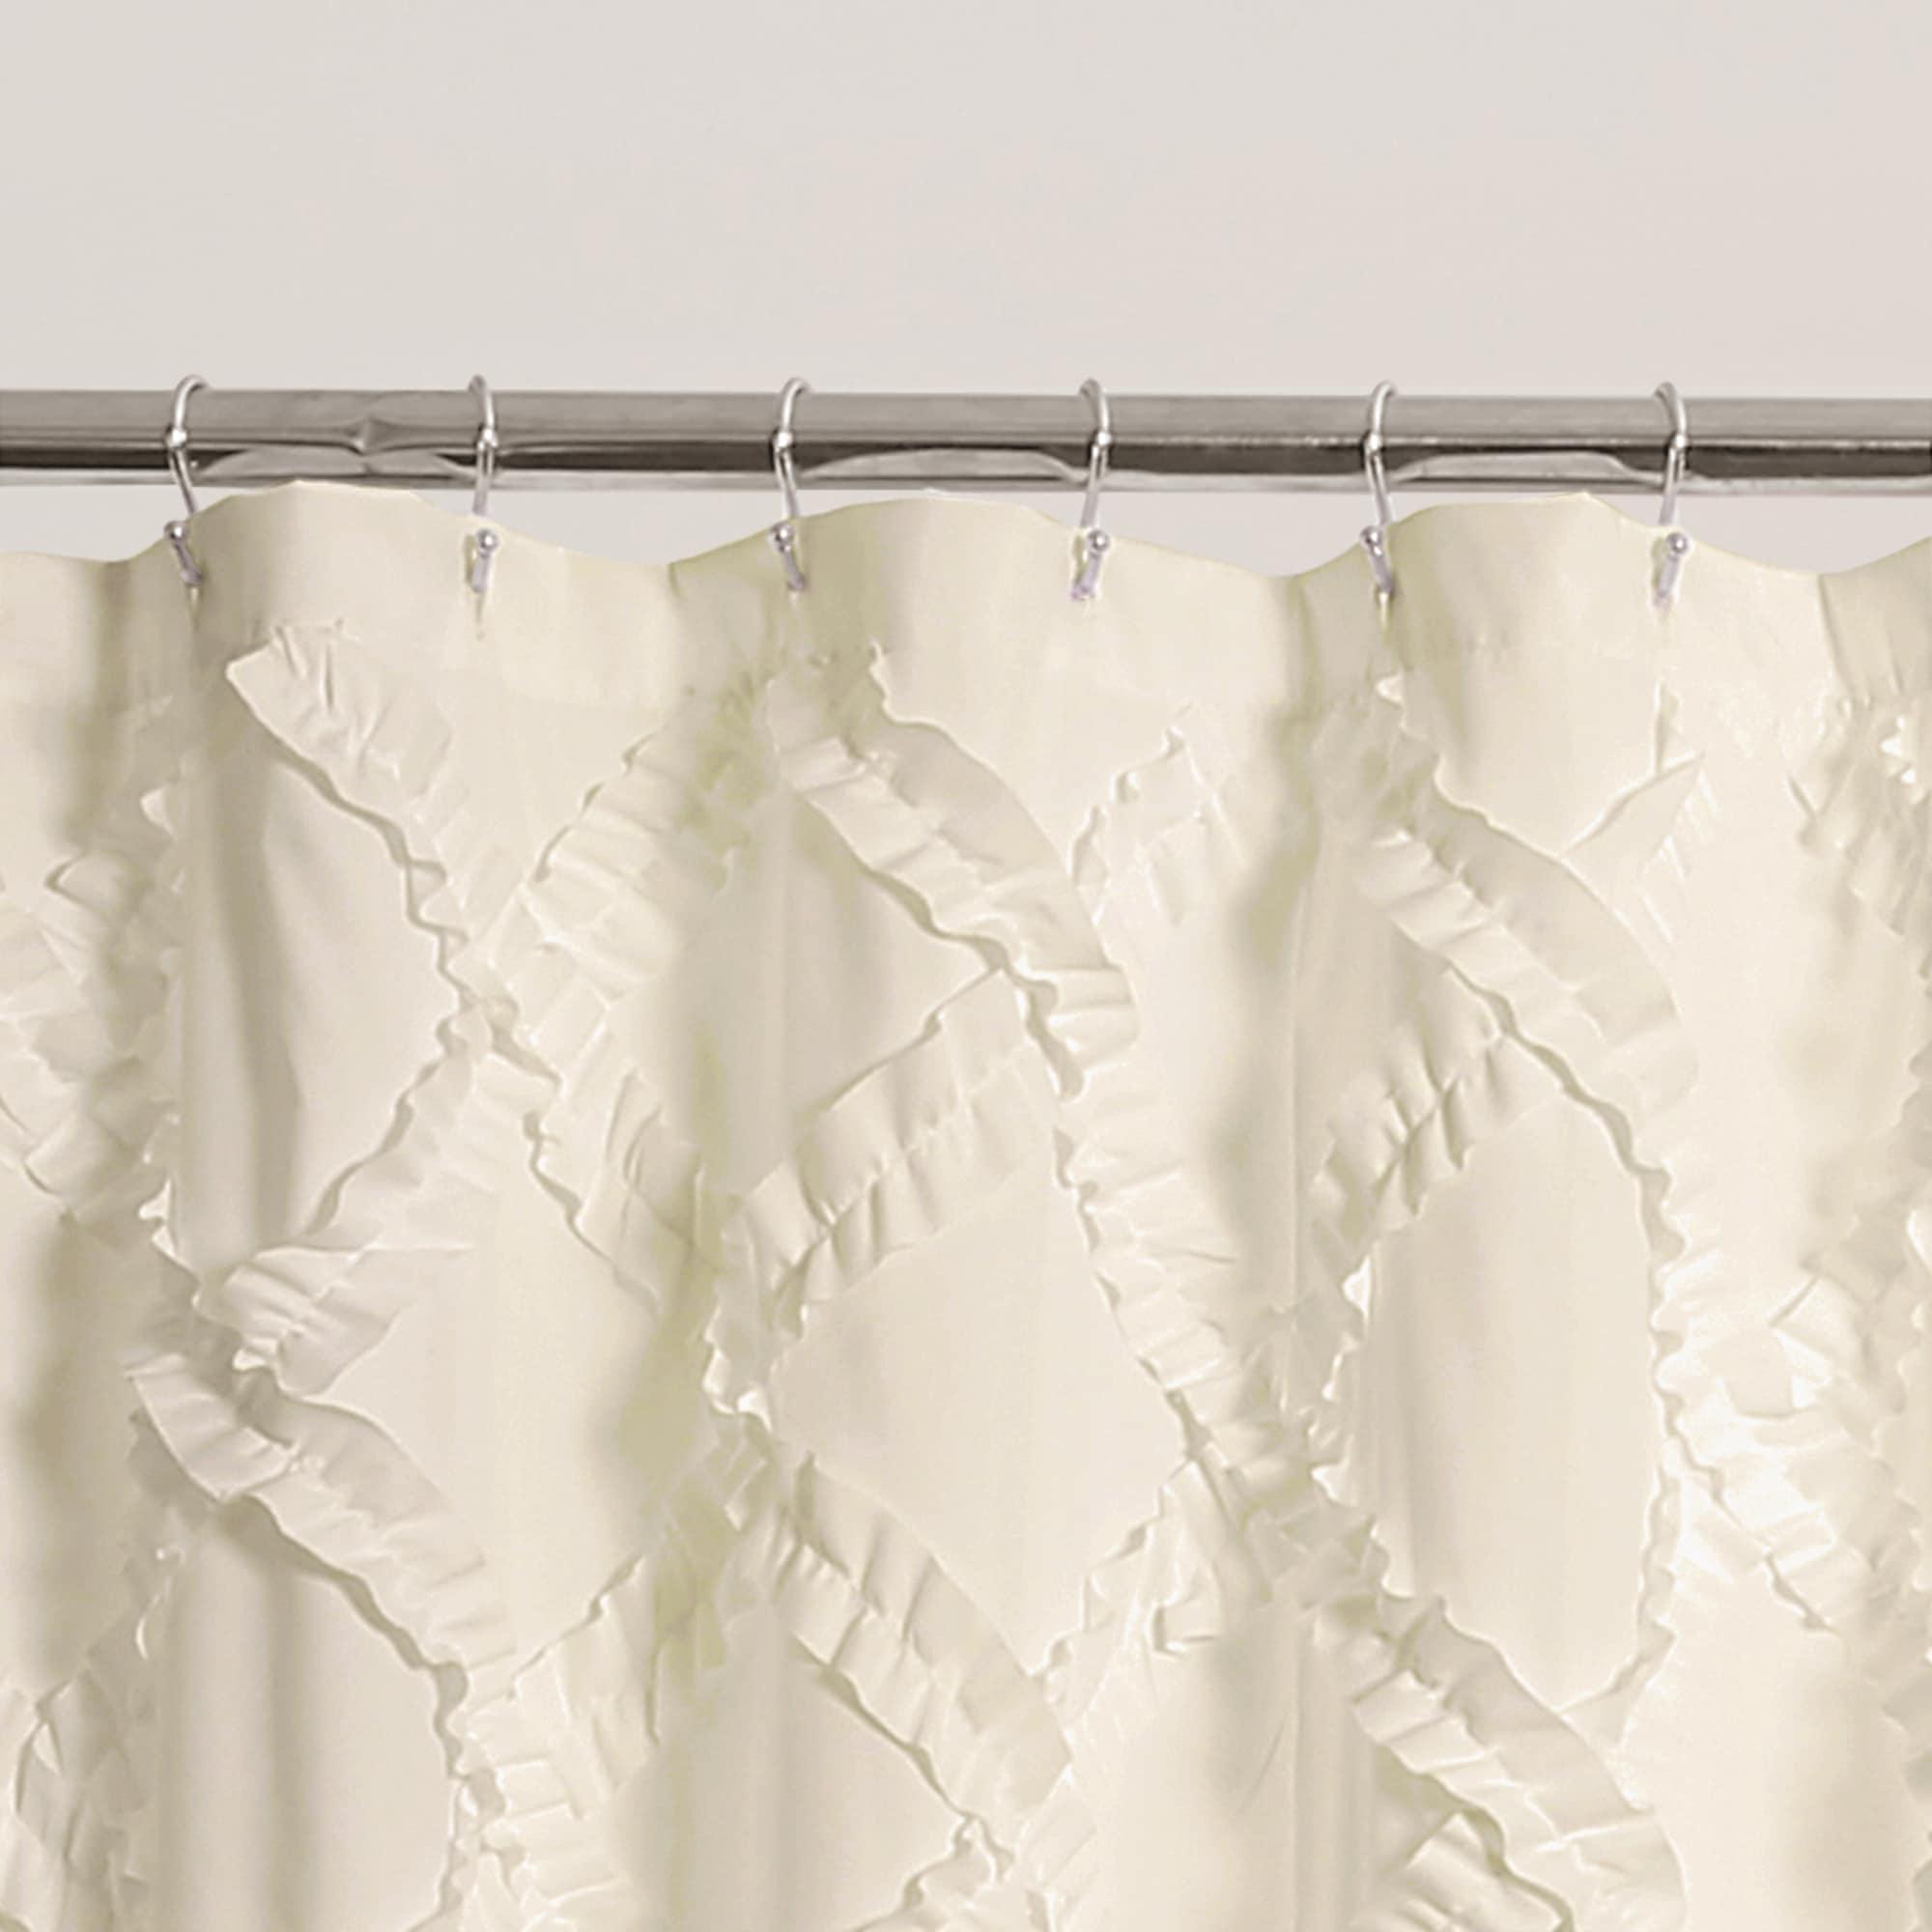 Lush Decor Ruffle Diamond Shower Curtain - Free Shipping Today ...